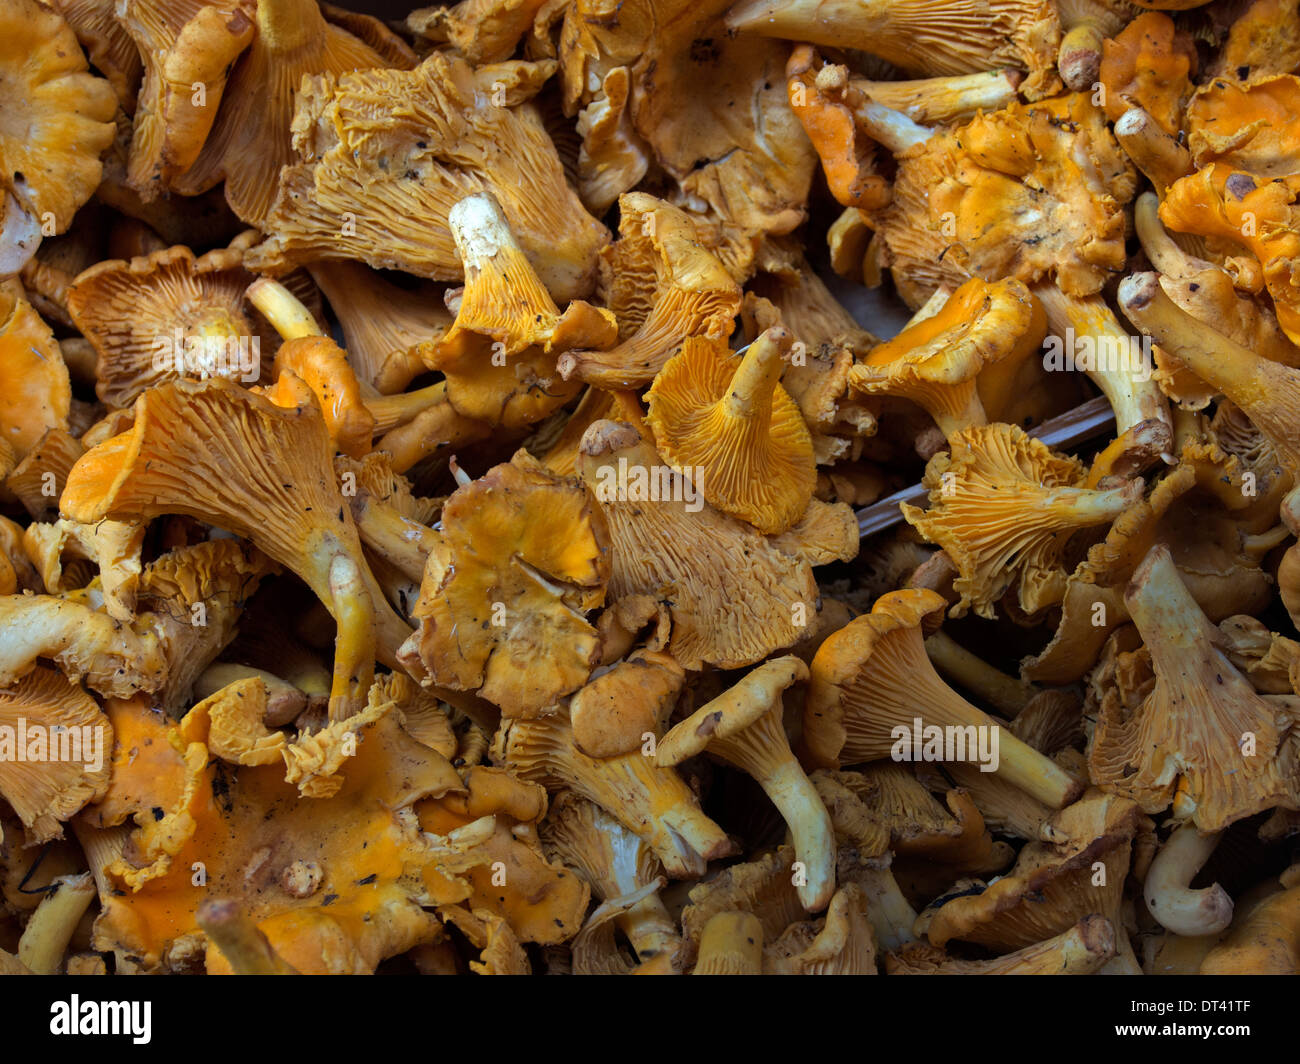 Chanterelle mushrooms on sale in a delicatessen in Bologna, Italy - Stock Image